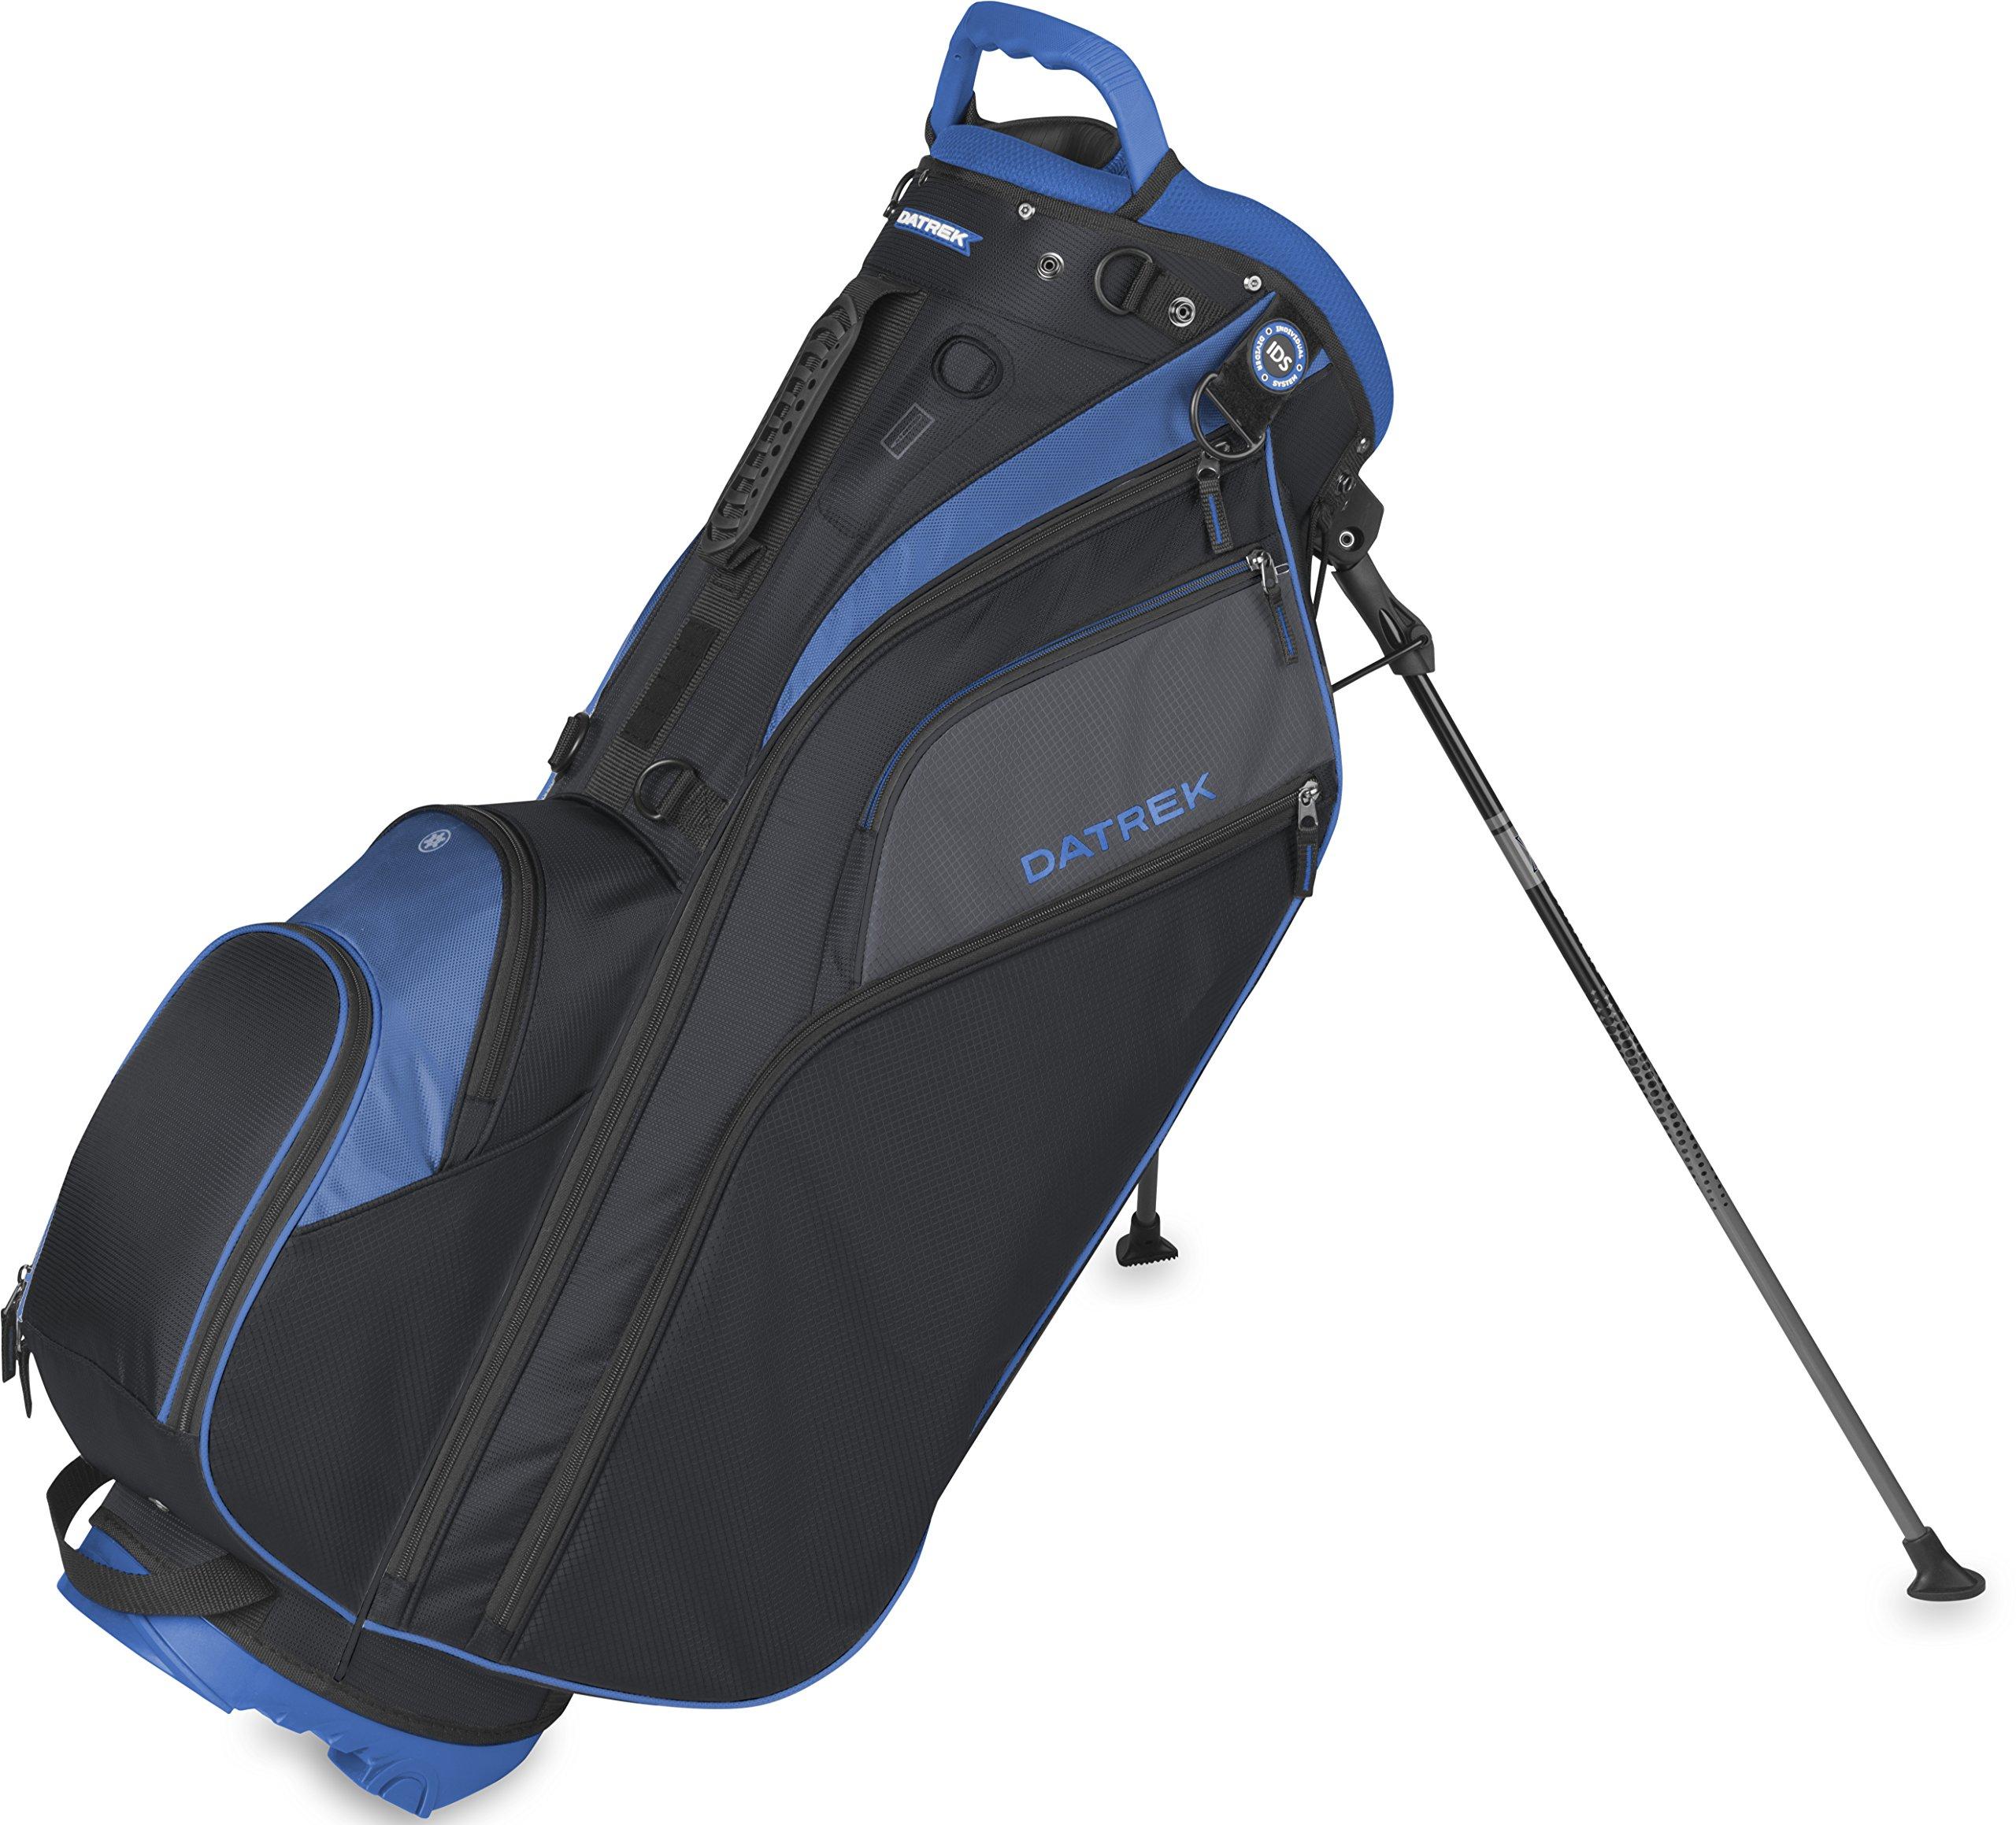 Datrek Golf Go Lite Hybrid Stand Bag (Black/Slate/Royal) by Datrek